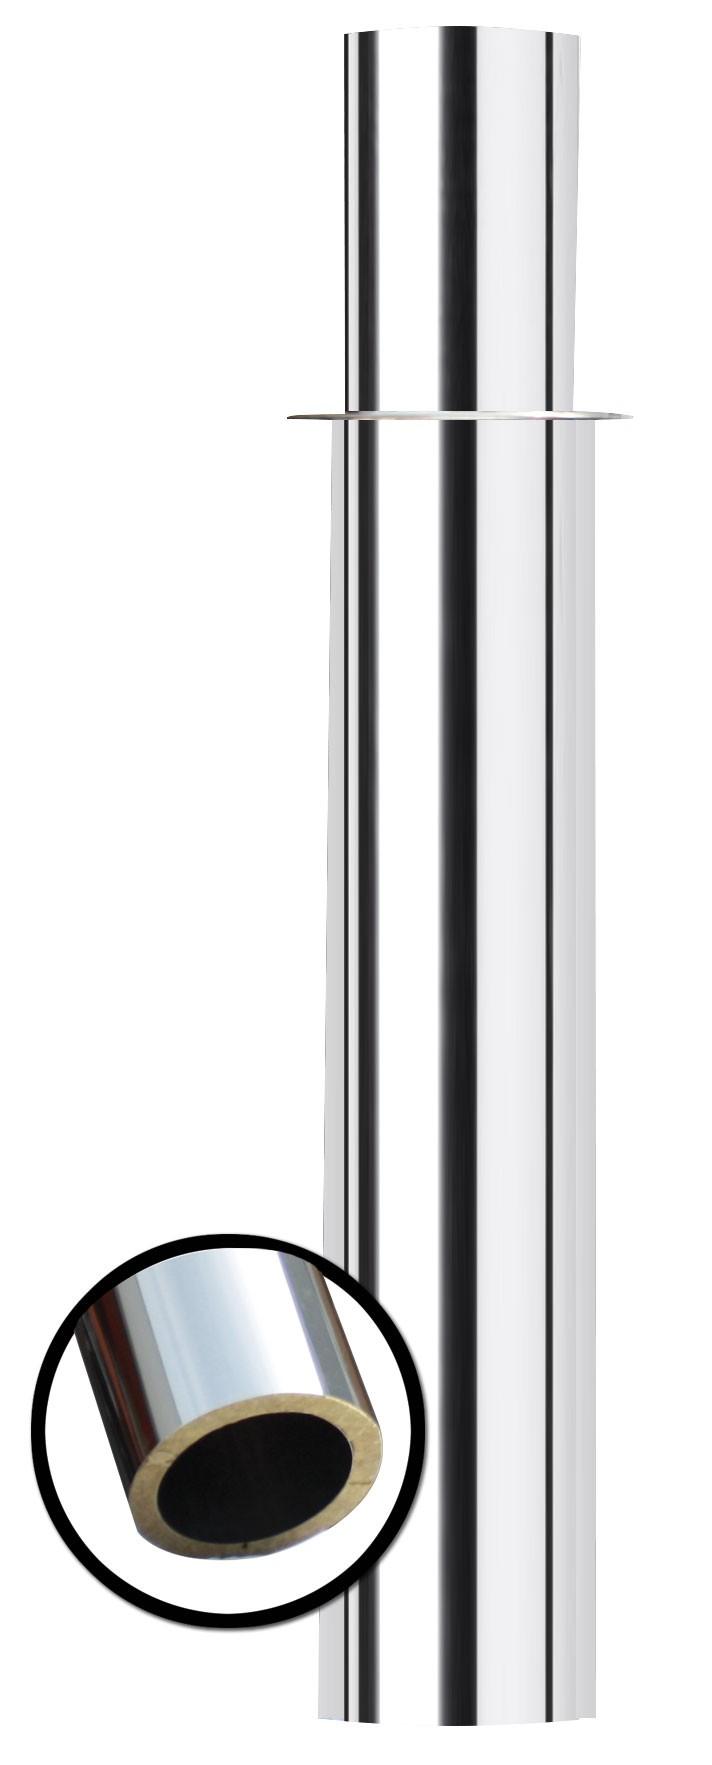 Verlängerungselement Edelstahl ohne Windkat 700mm Ø 150 mm Bild 1